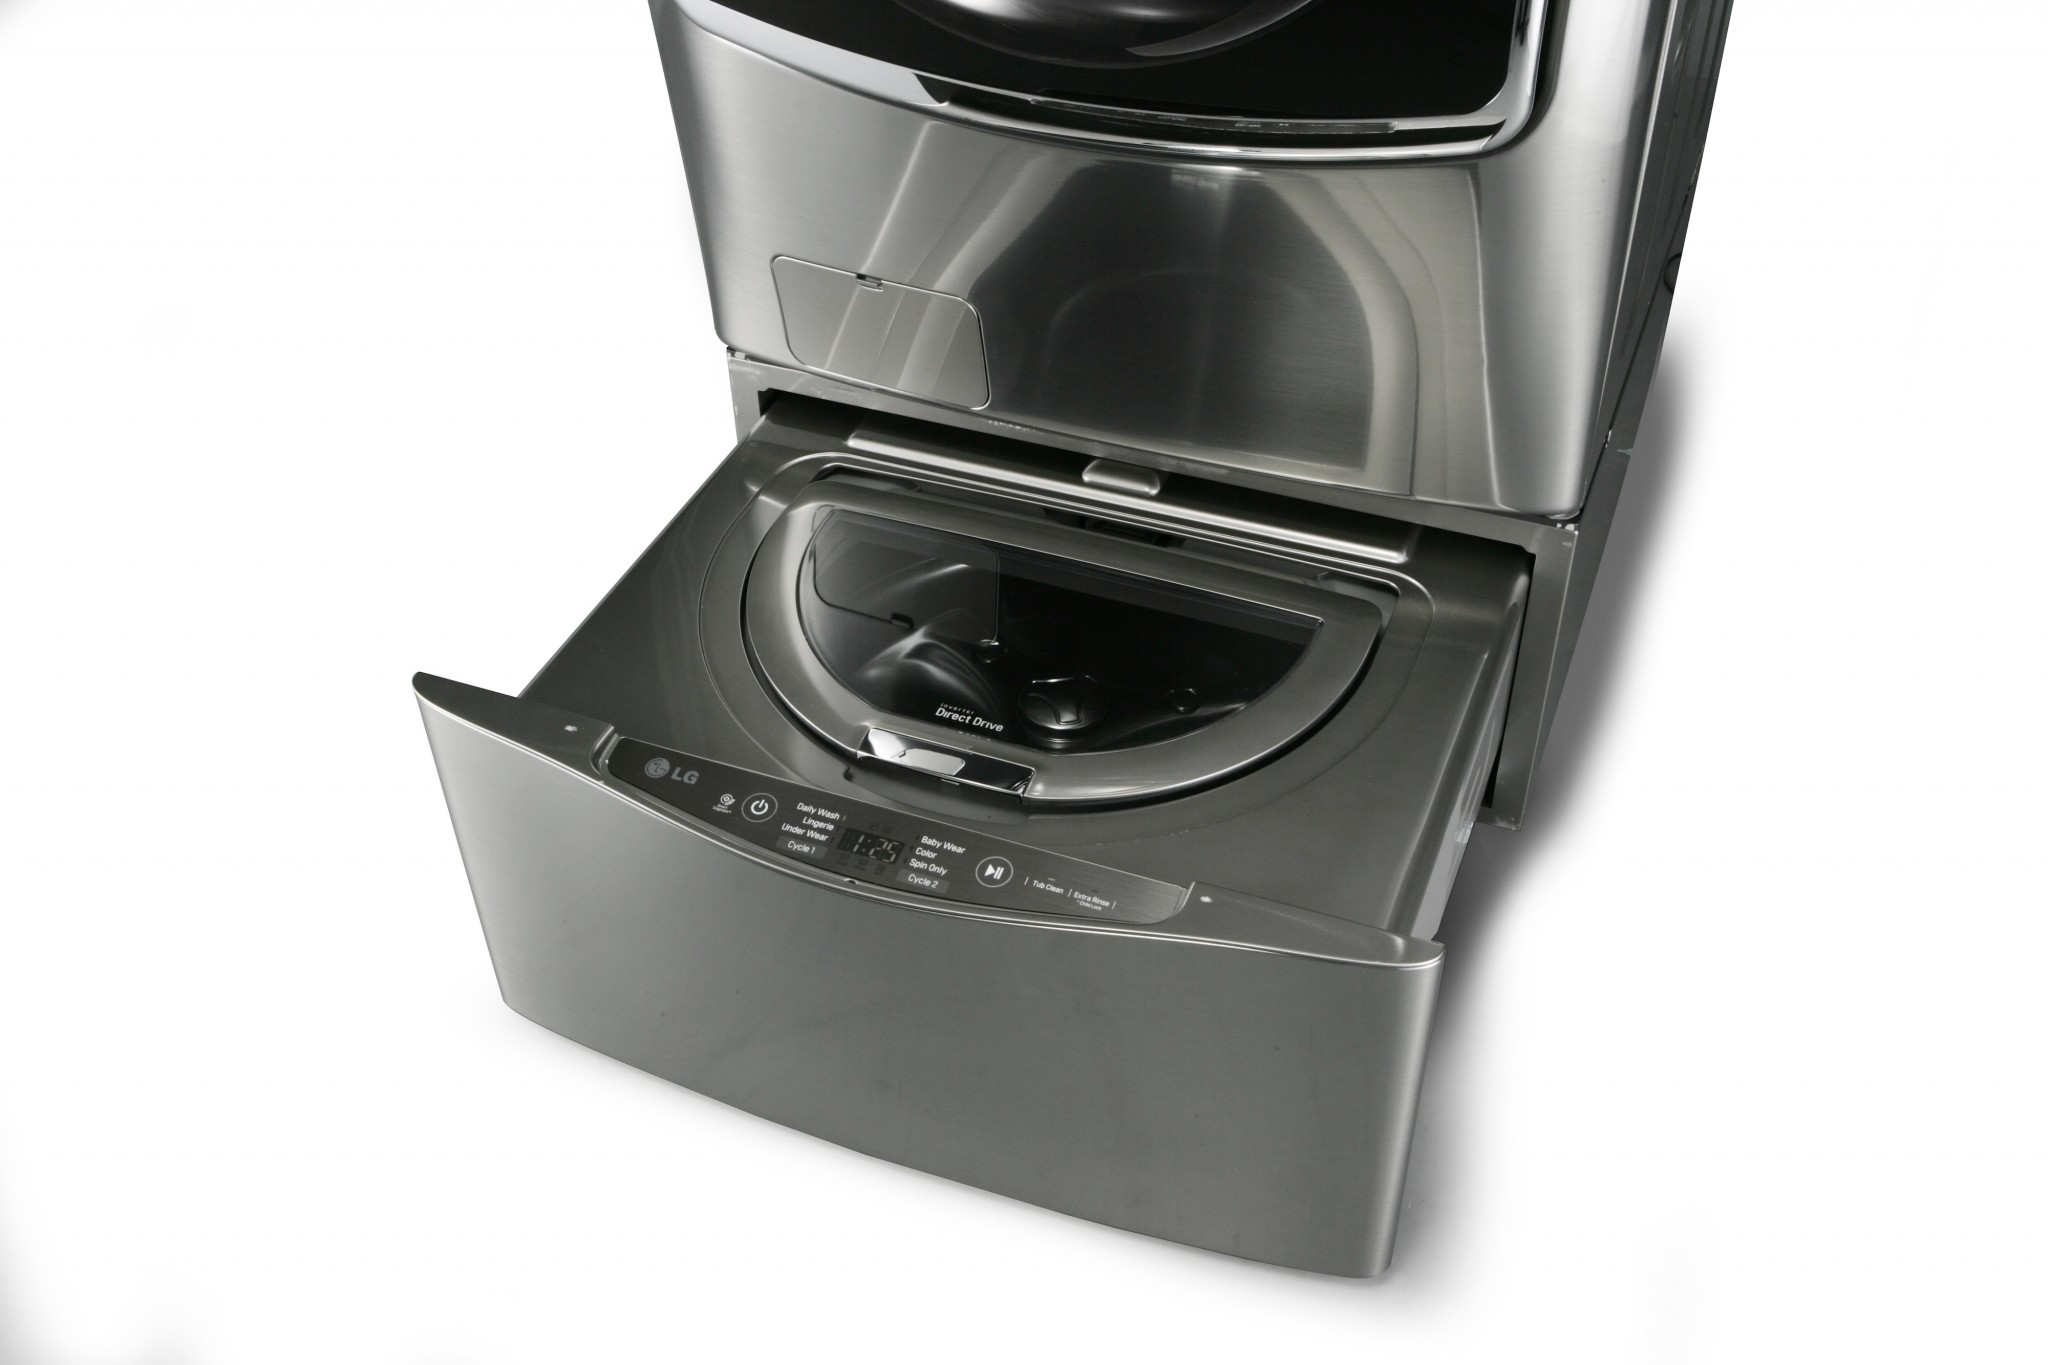 and pedestals info washer whirlpool dryer pedestal samsung dimensions acke duet